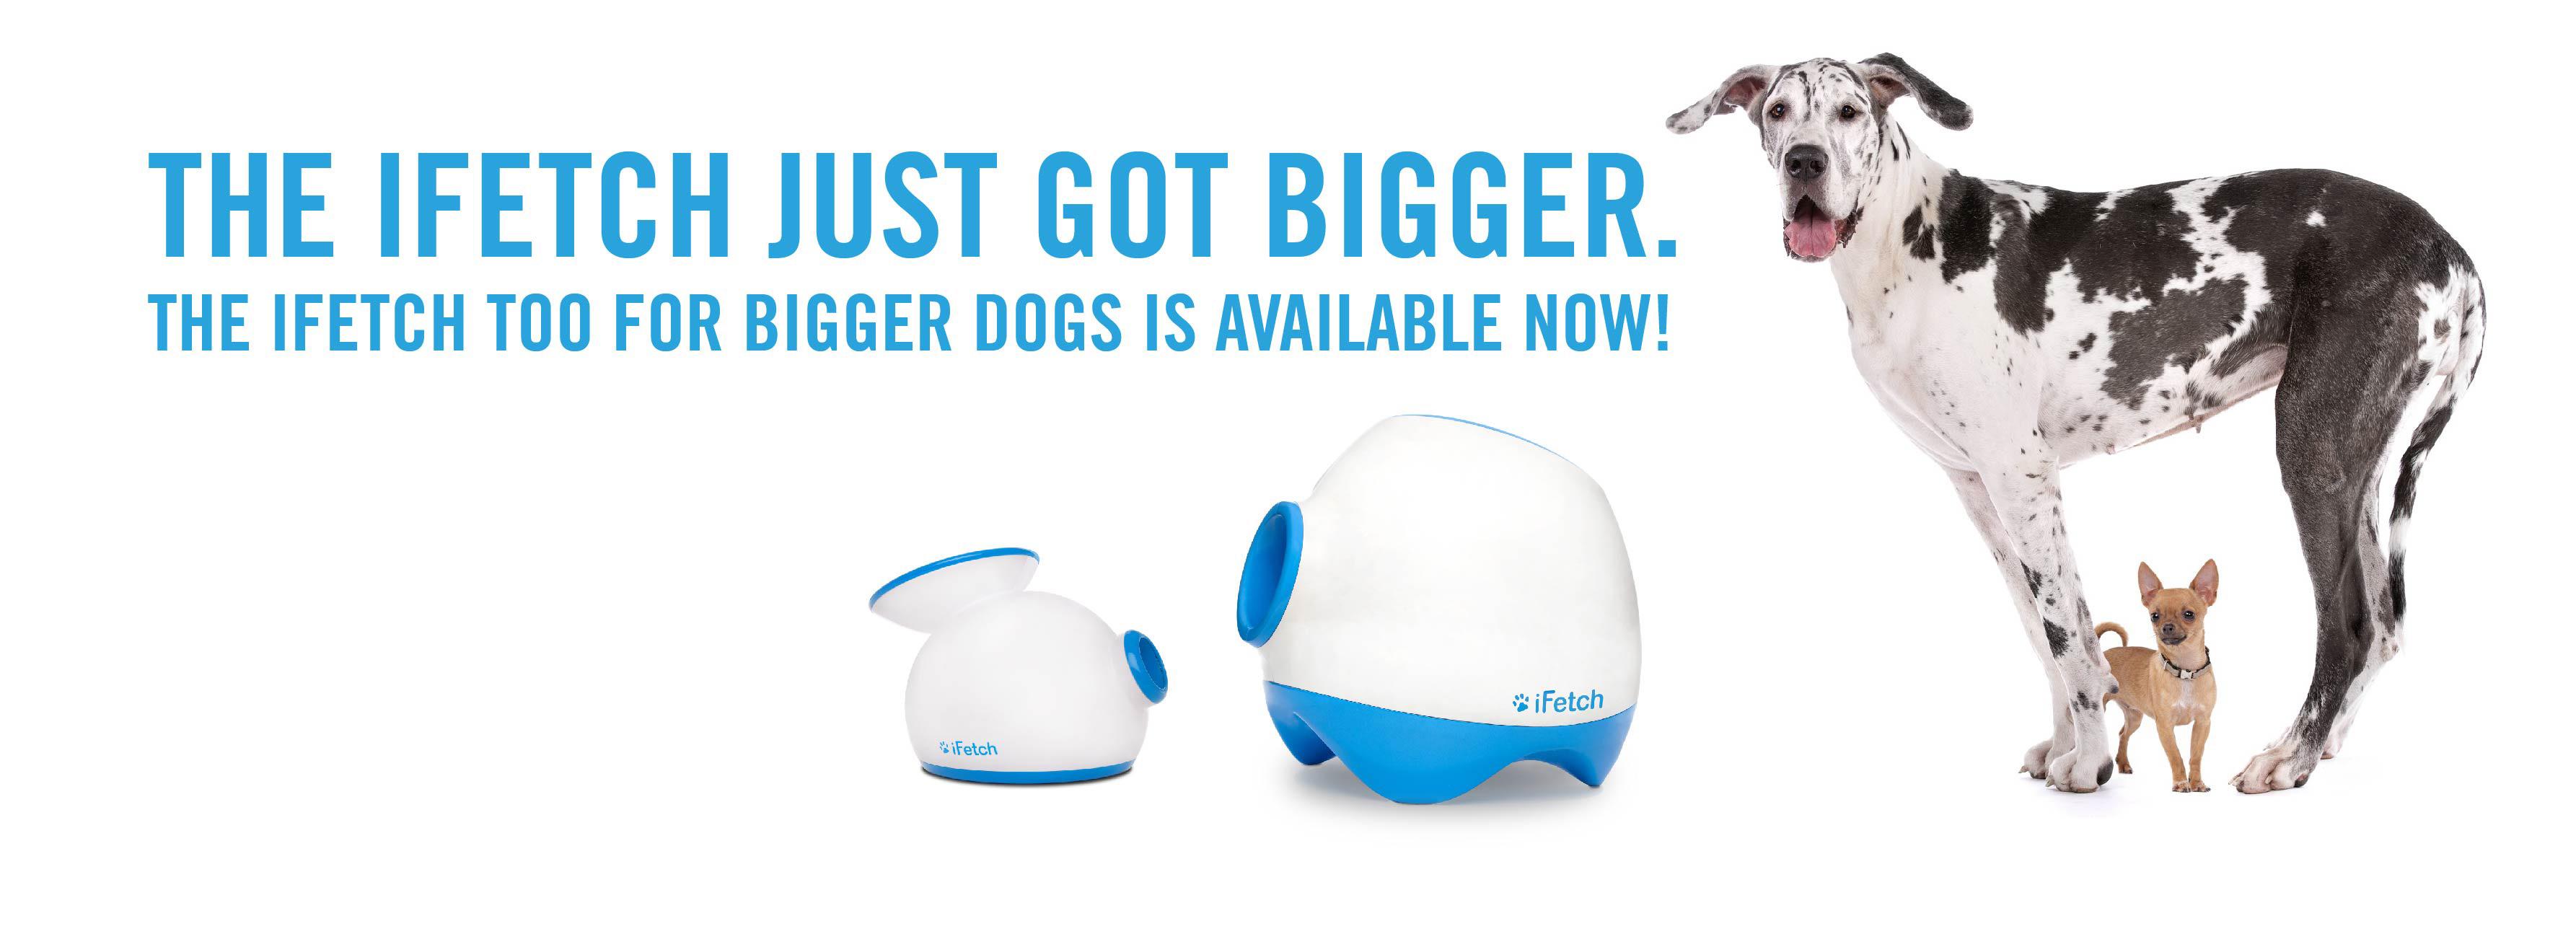 iFetchToo lanza pelotas para tu perro